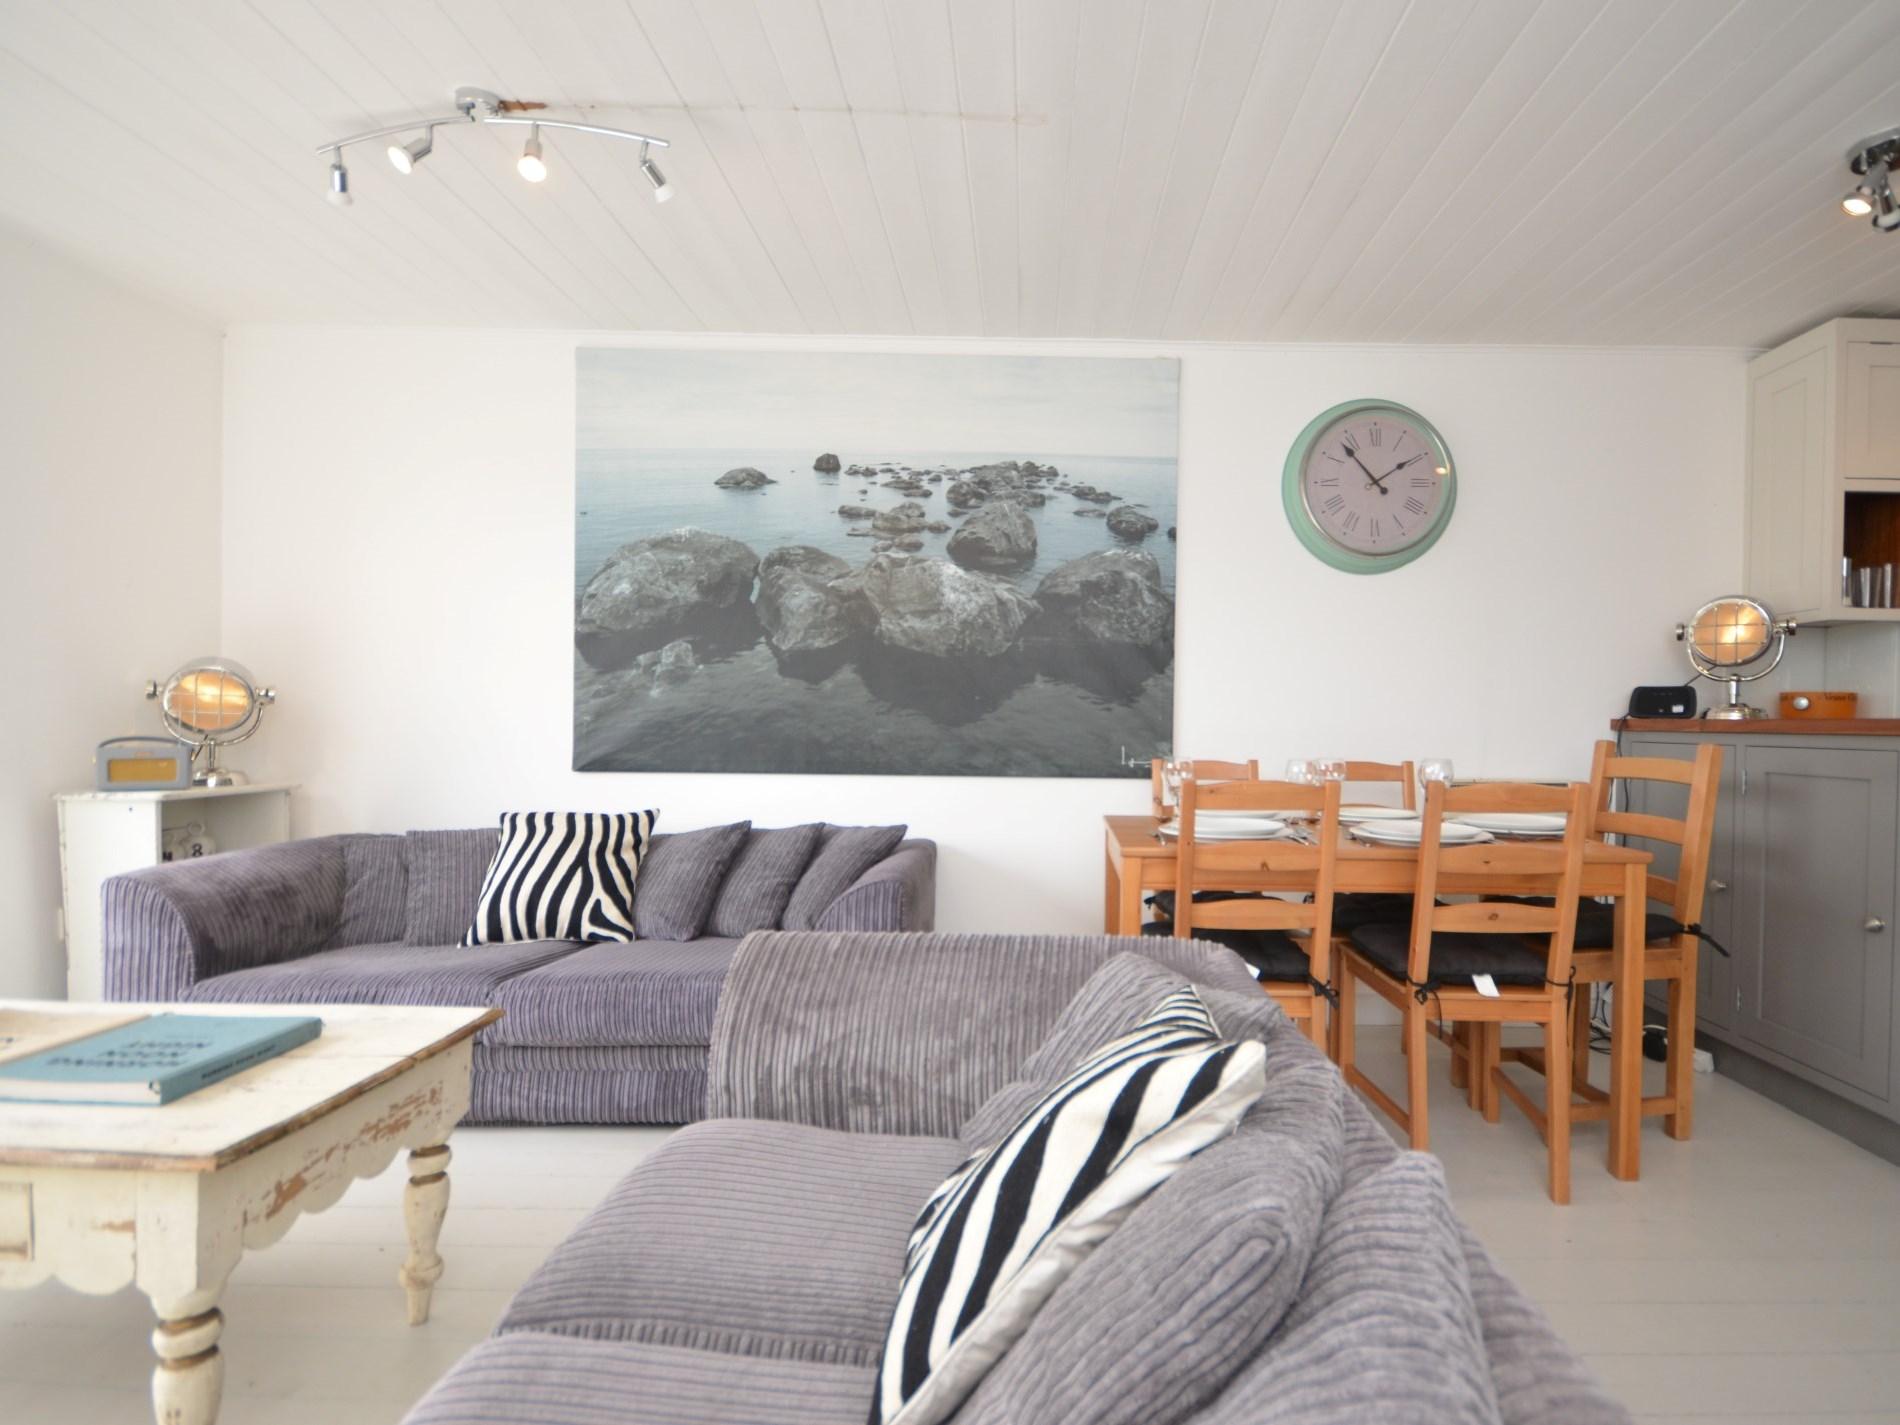 Stylish interiors